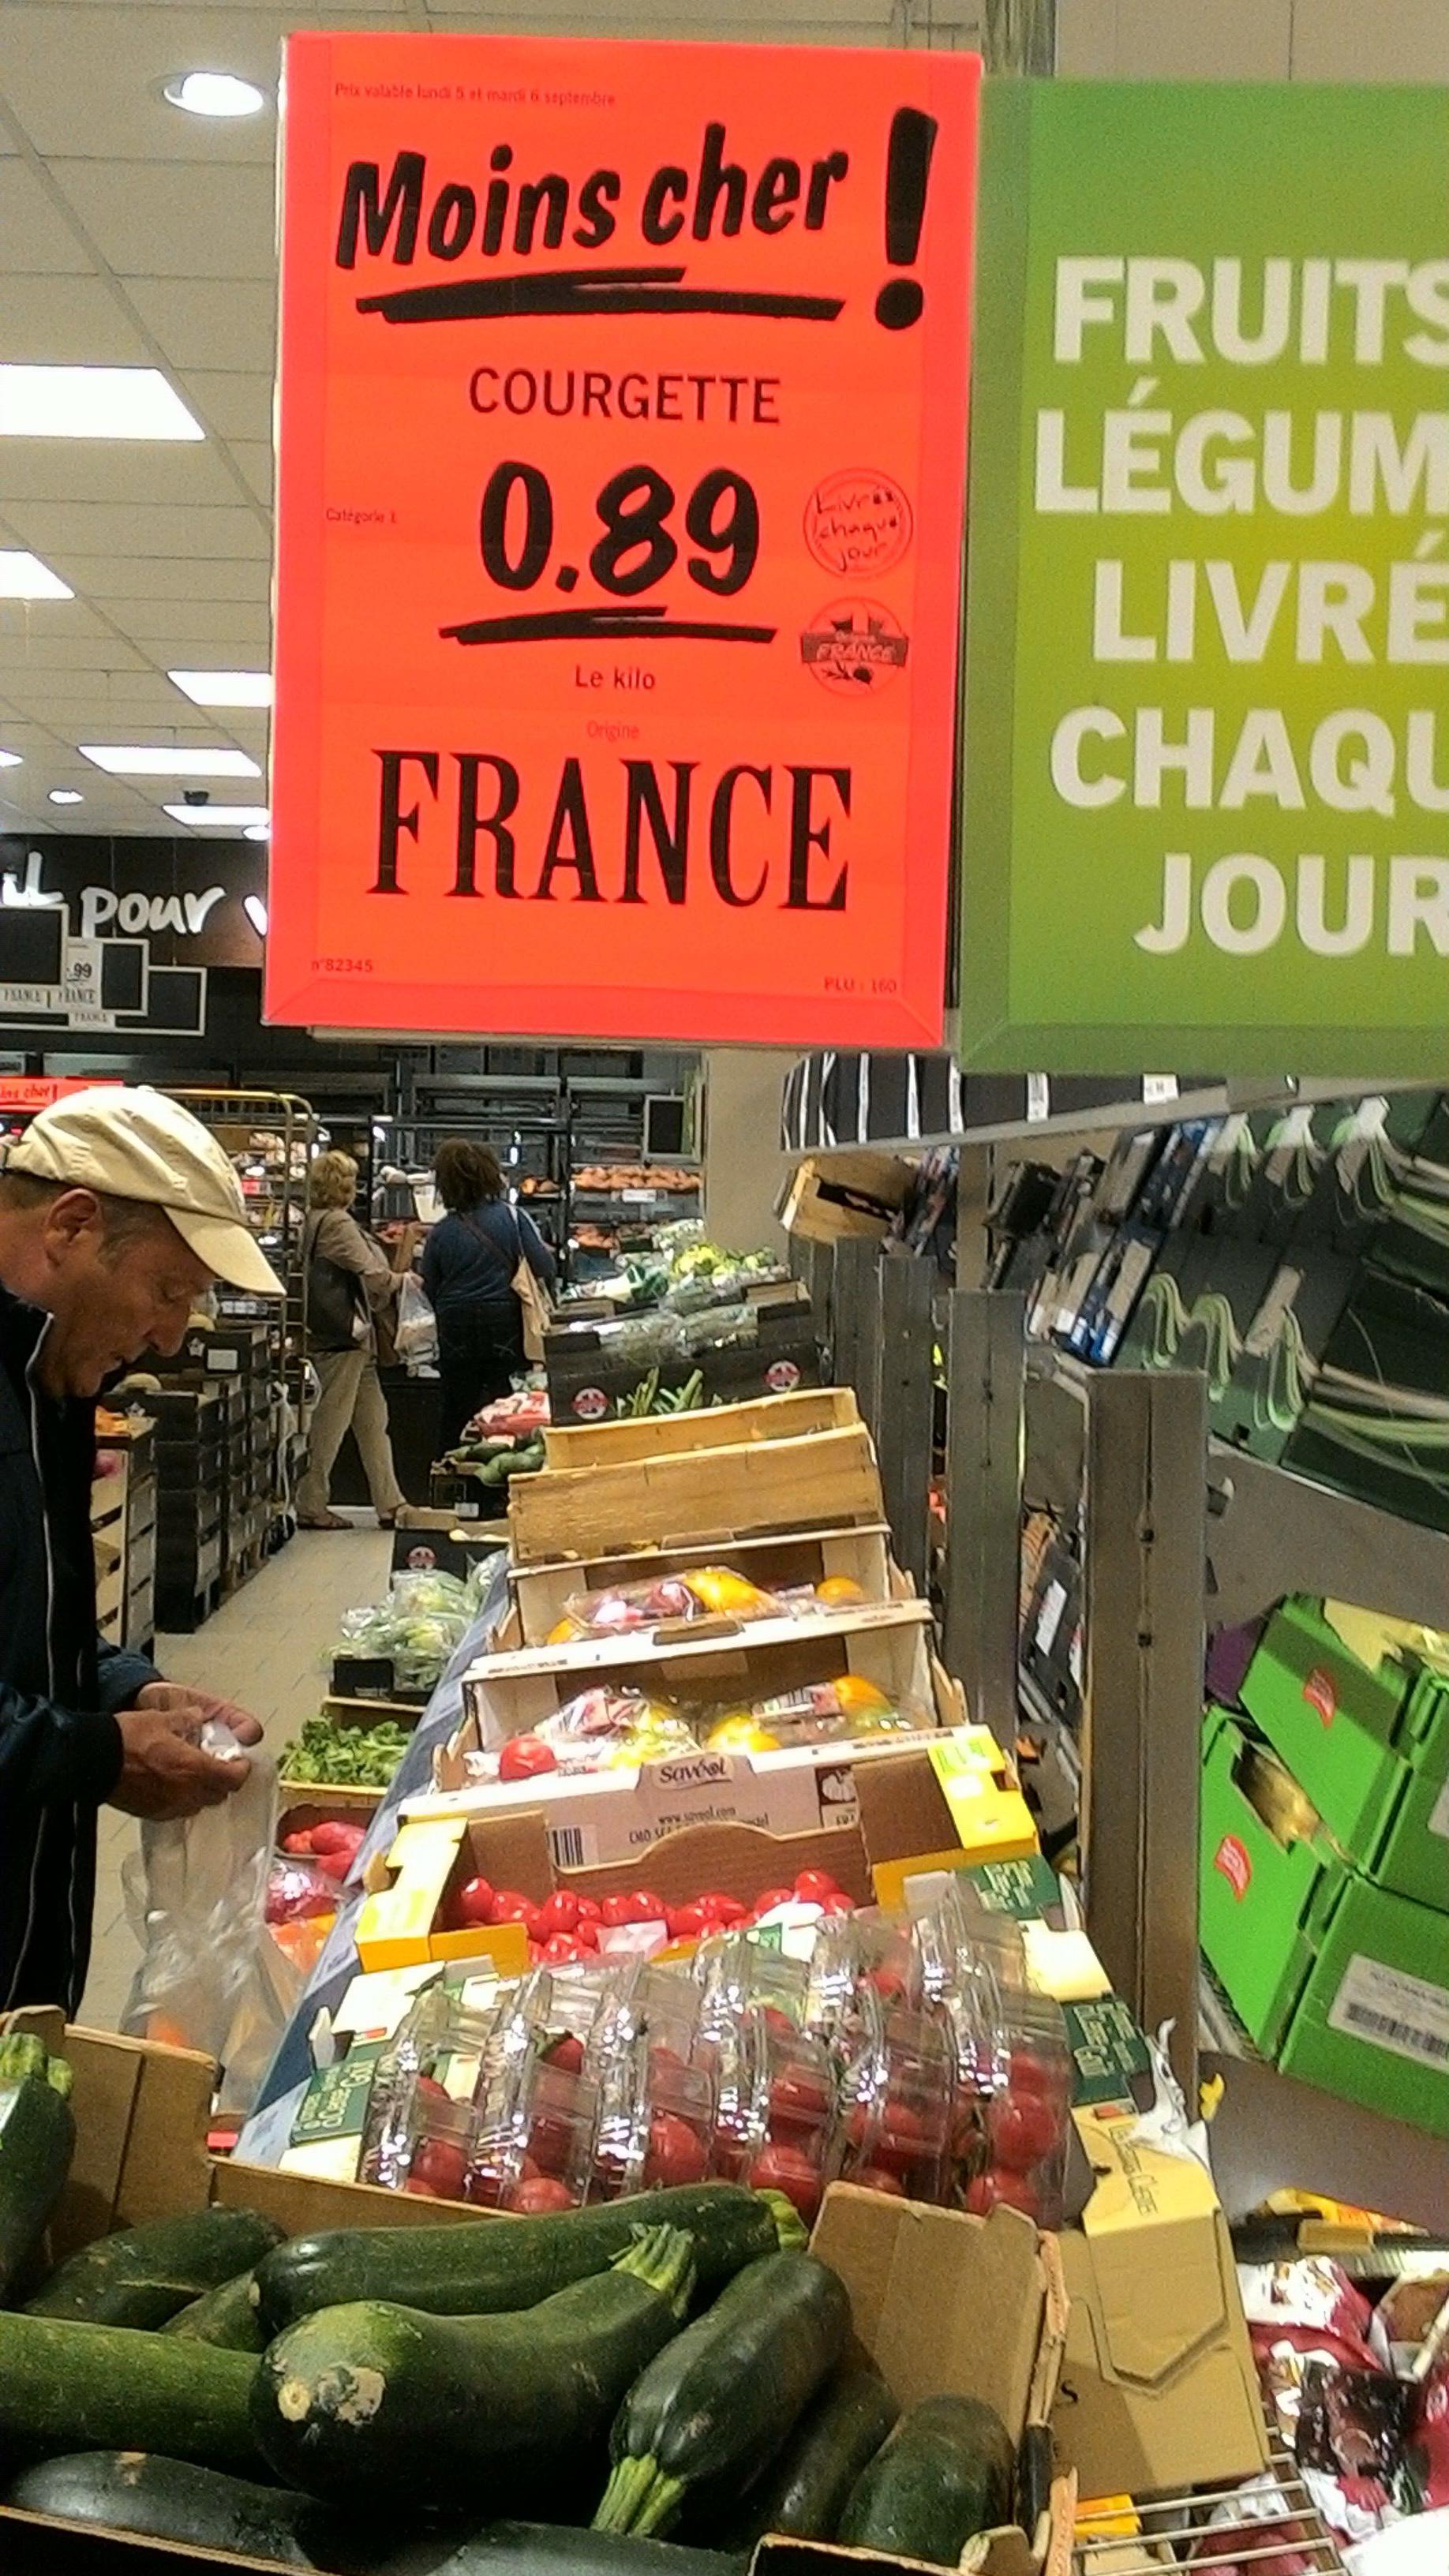 Le kilo de Courgette origine France